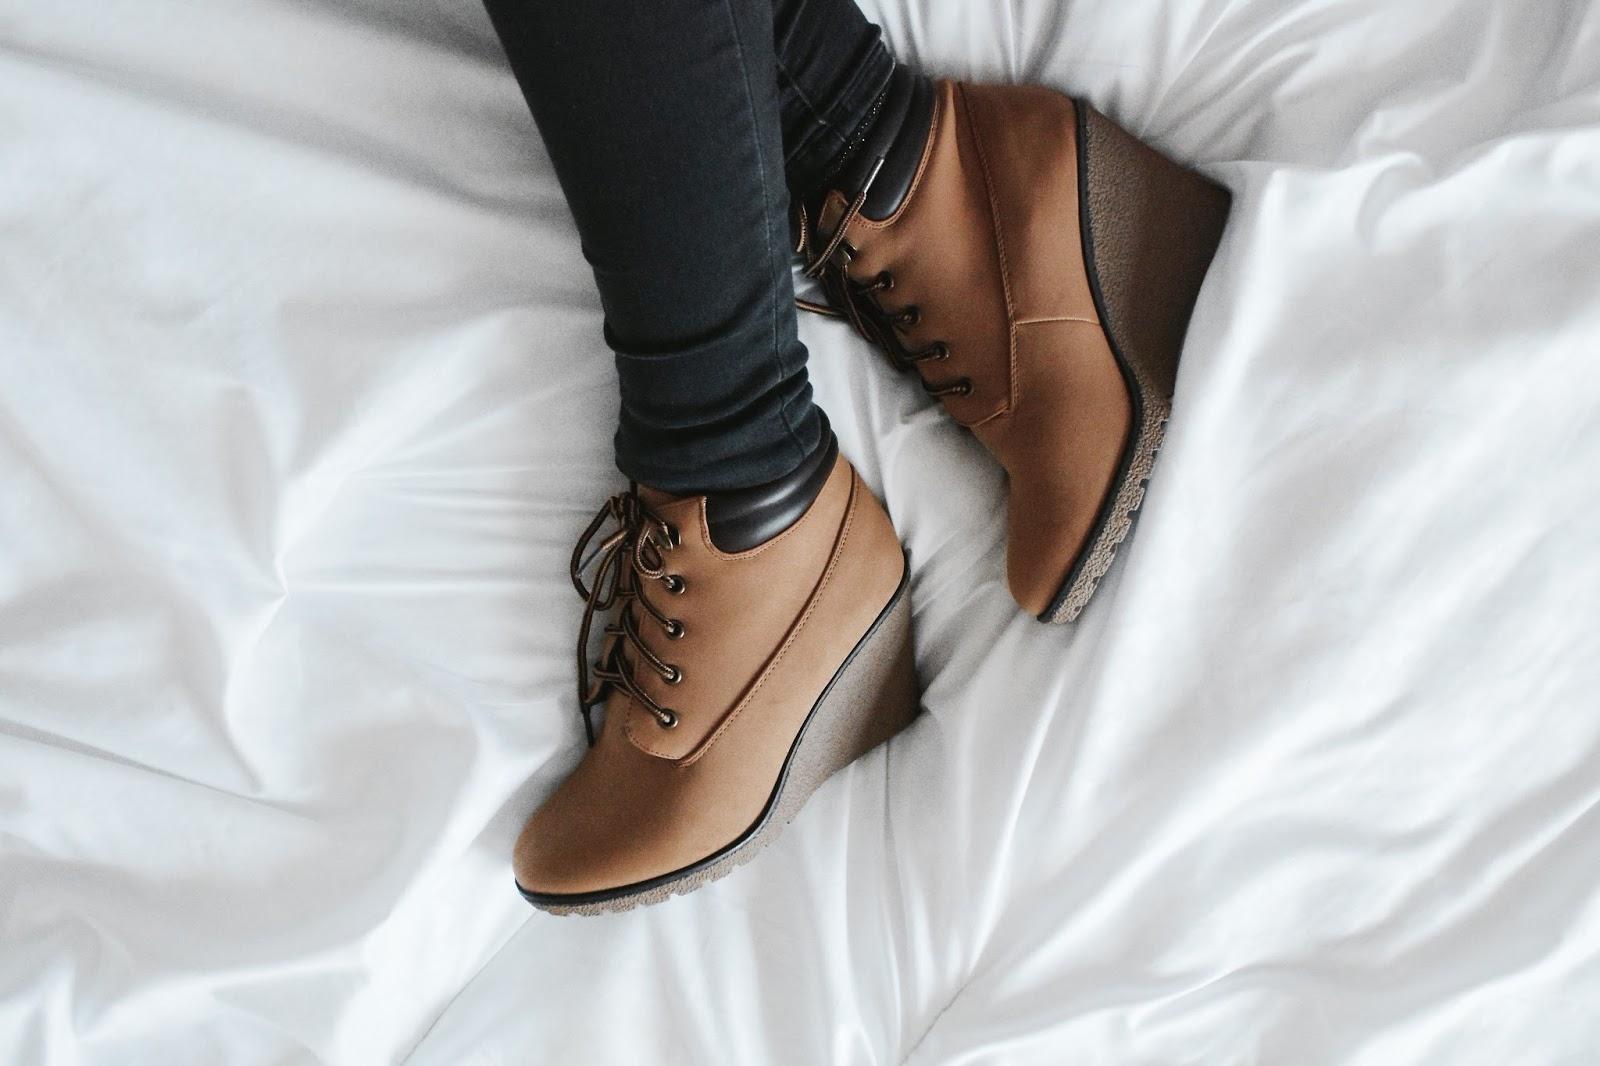 Primary, Primark Haul, Primark Boots, Brown Boots, Wedges, Autumn Boots, Primark wedge boots,